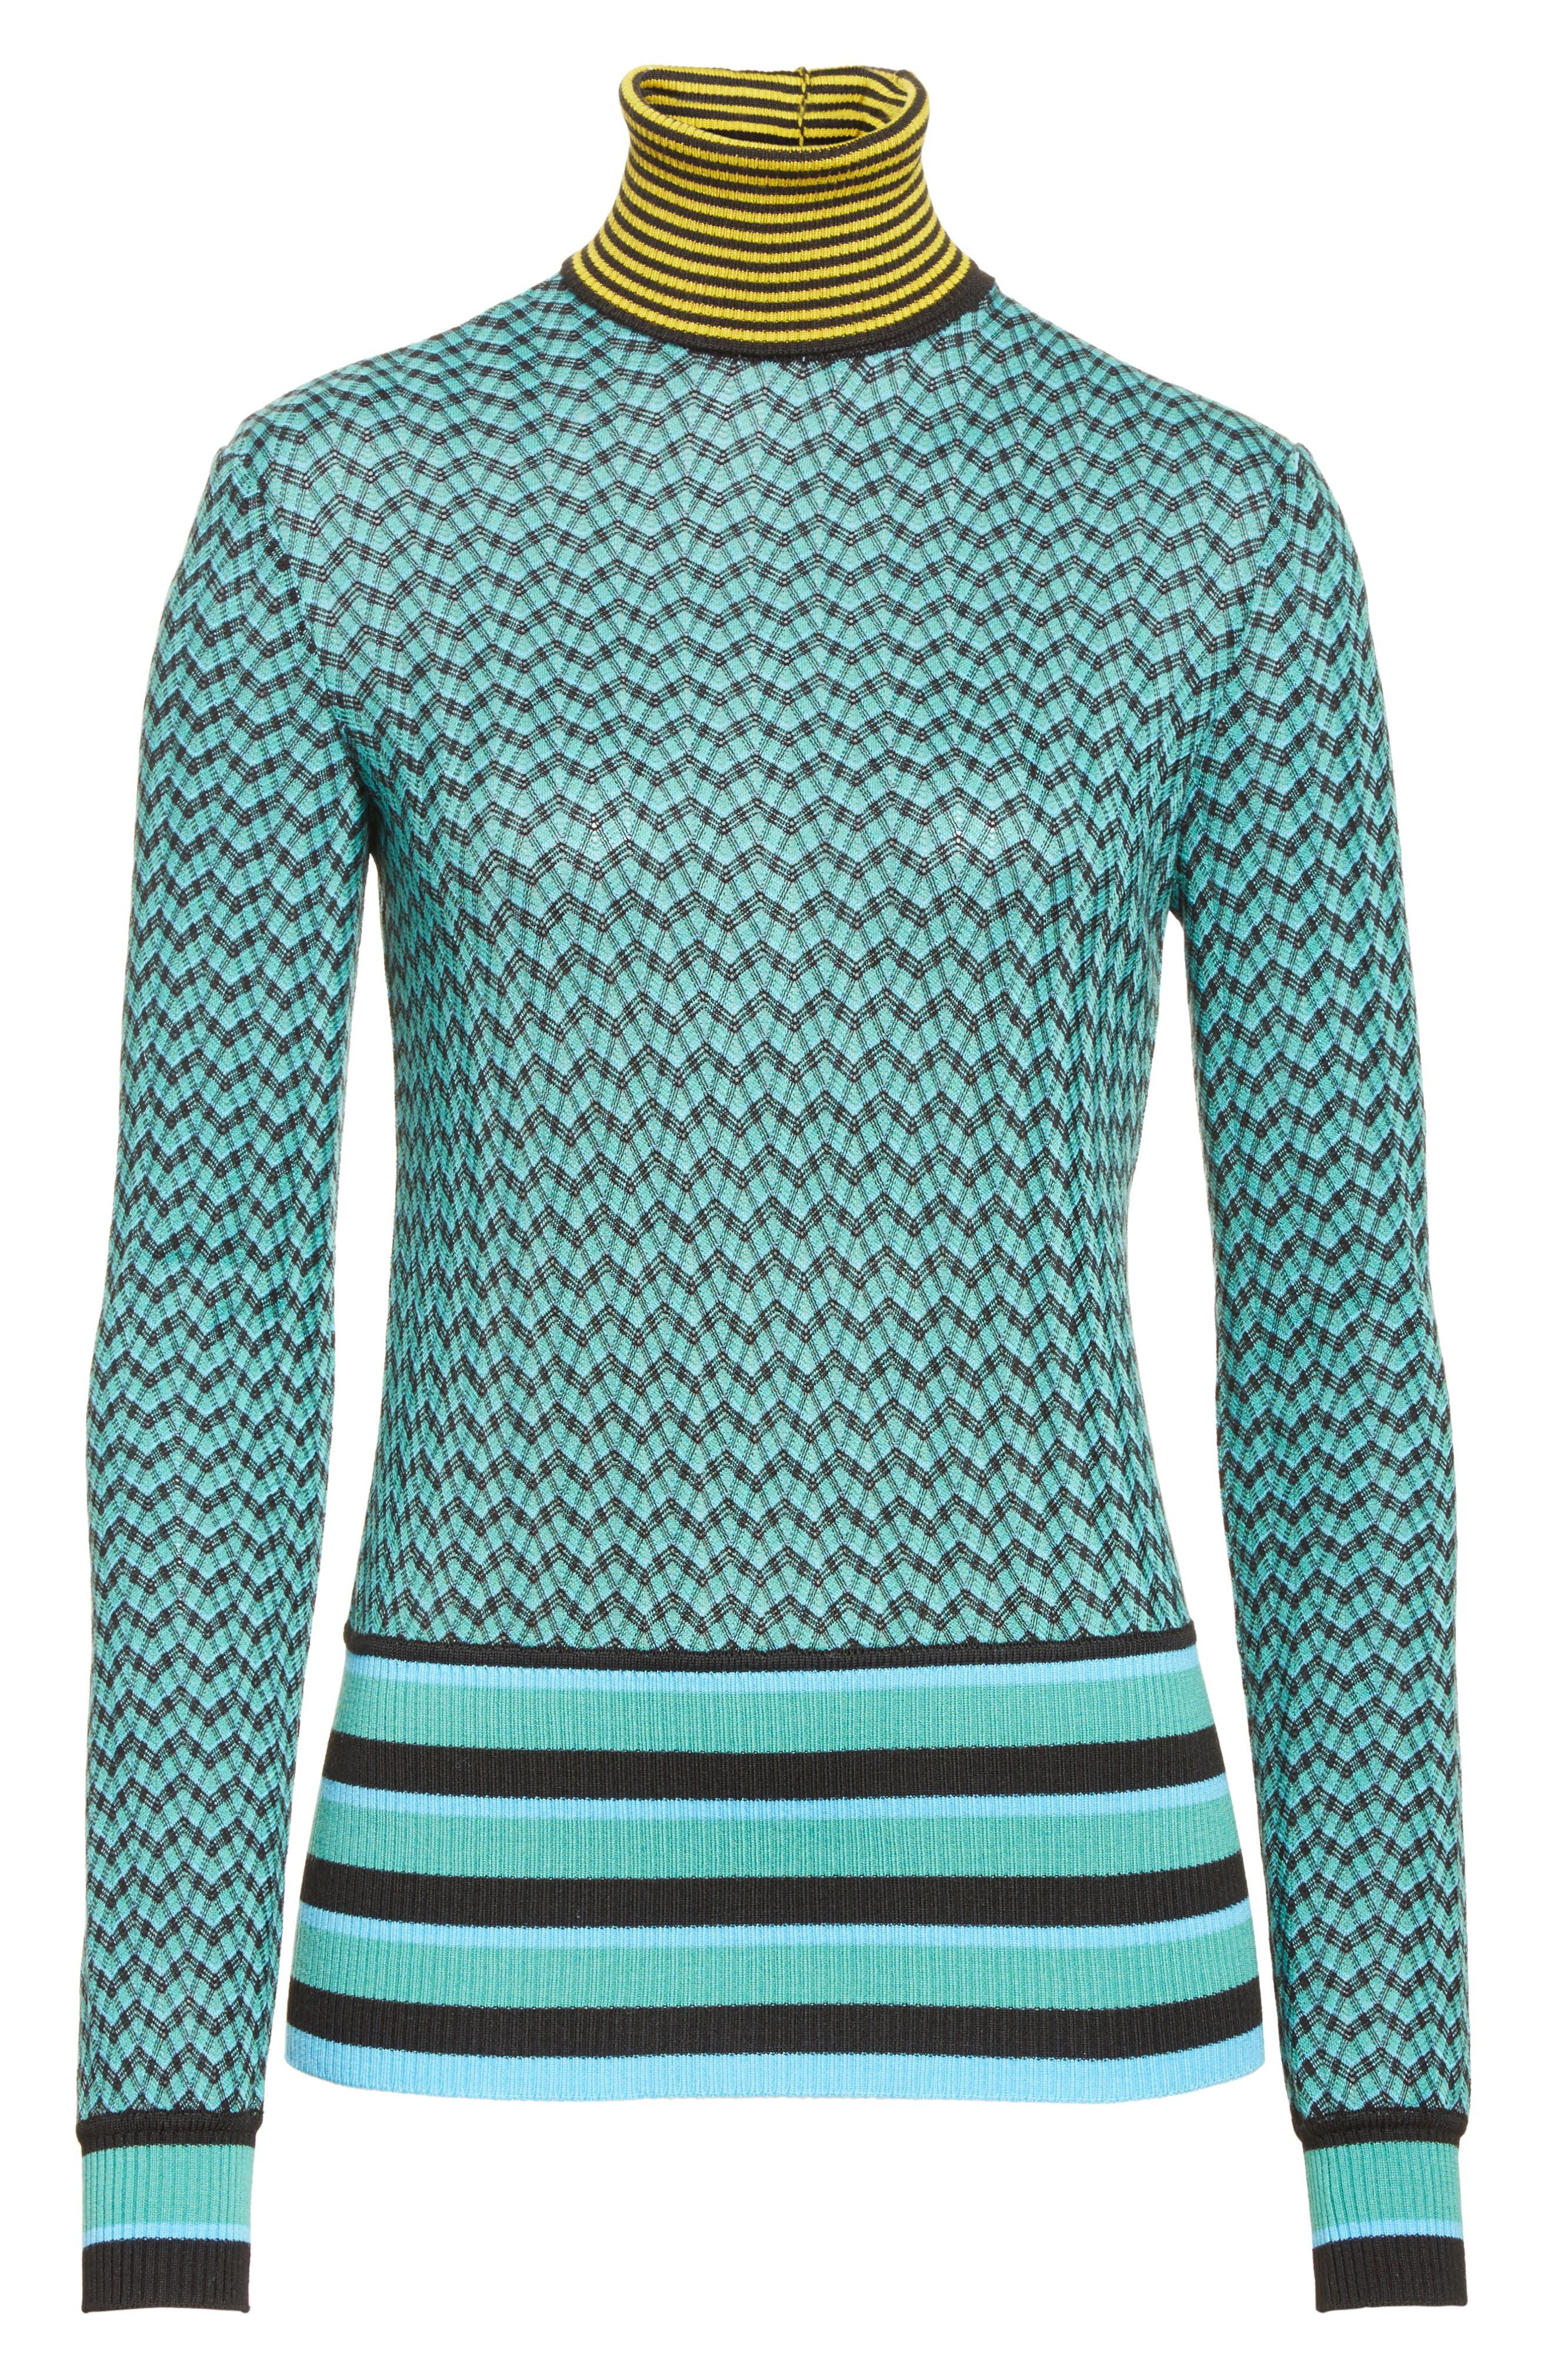 Zigzag & Stripe Mock Neck Sweater,                             Alternate thumbnail 6, color,                             Green/ Blue